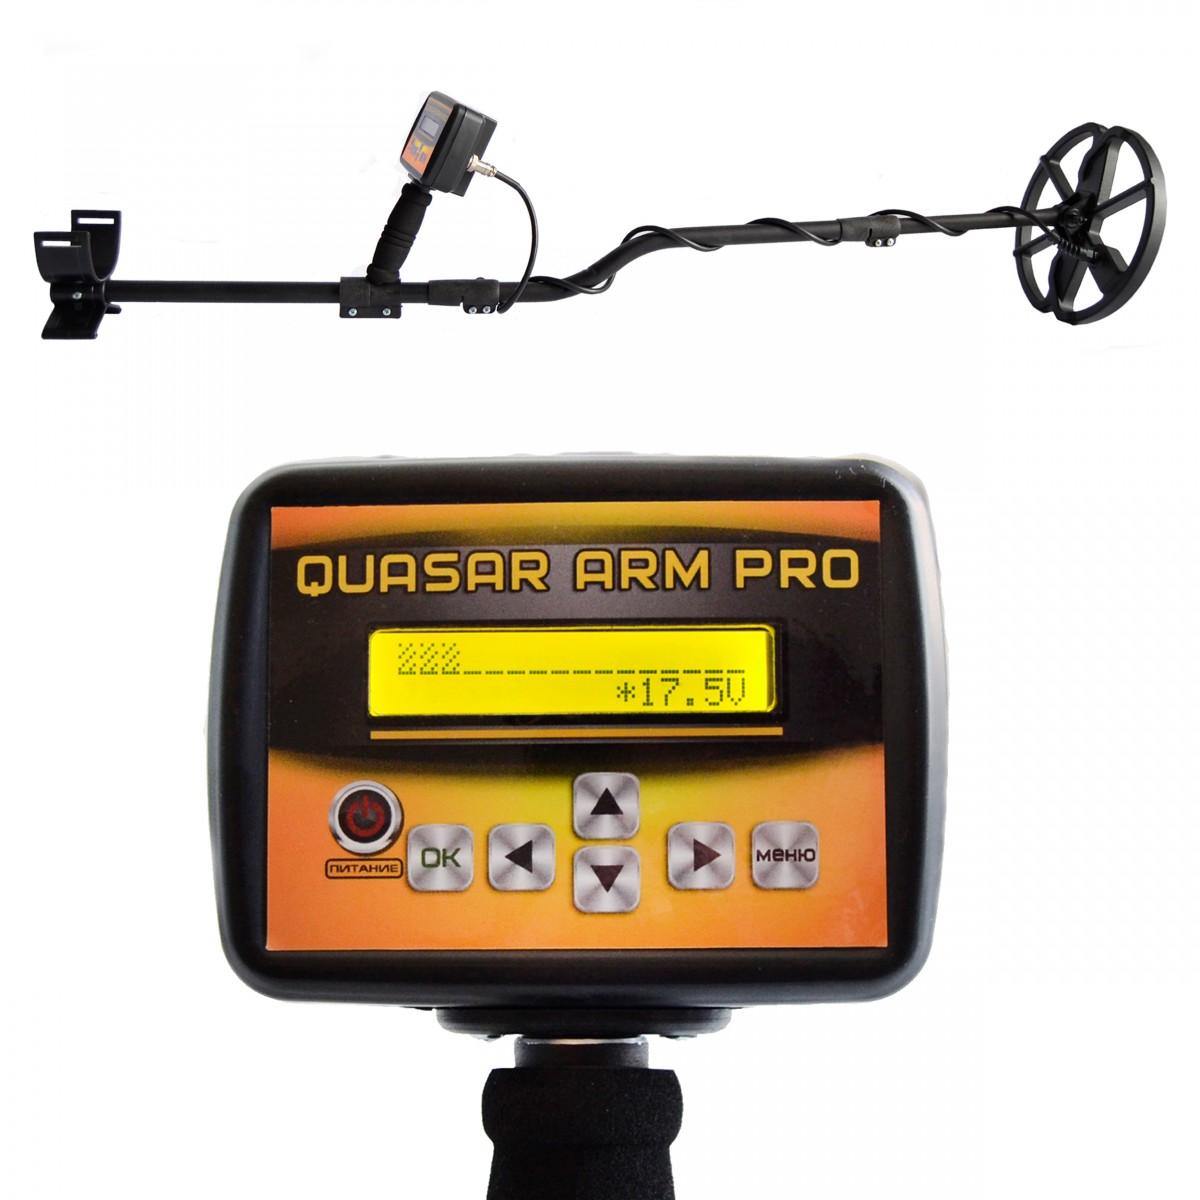 Металлоискатель Квазар ARM Про/Quasar ARM PRO с FM трансмиттером и регулятором тока ТХ